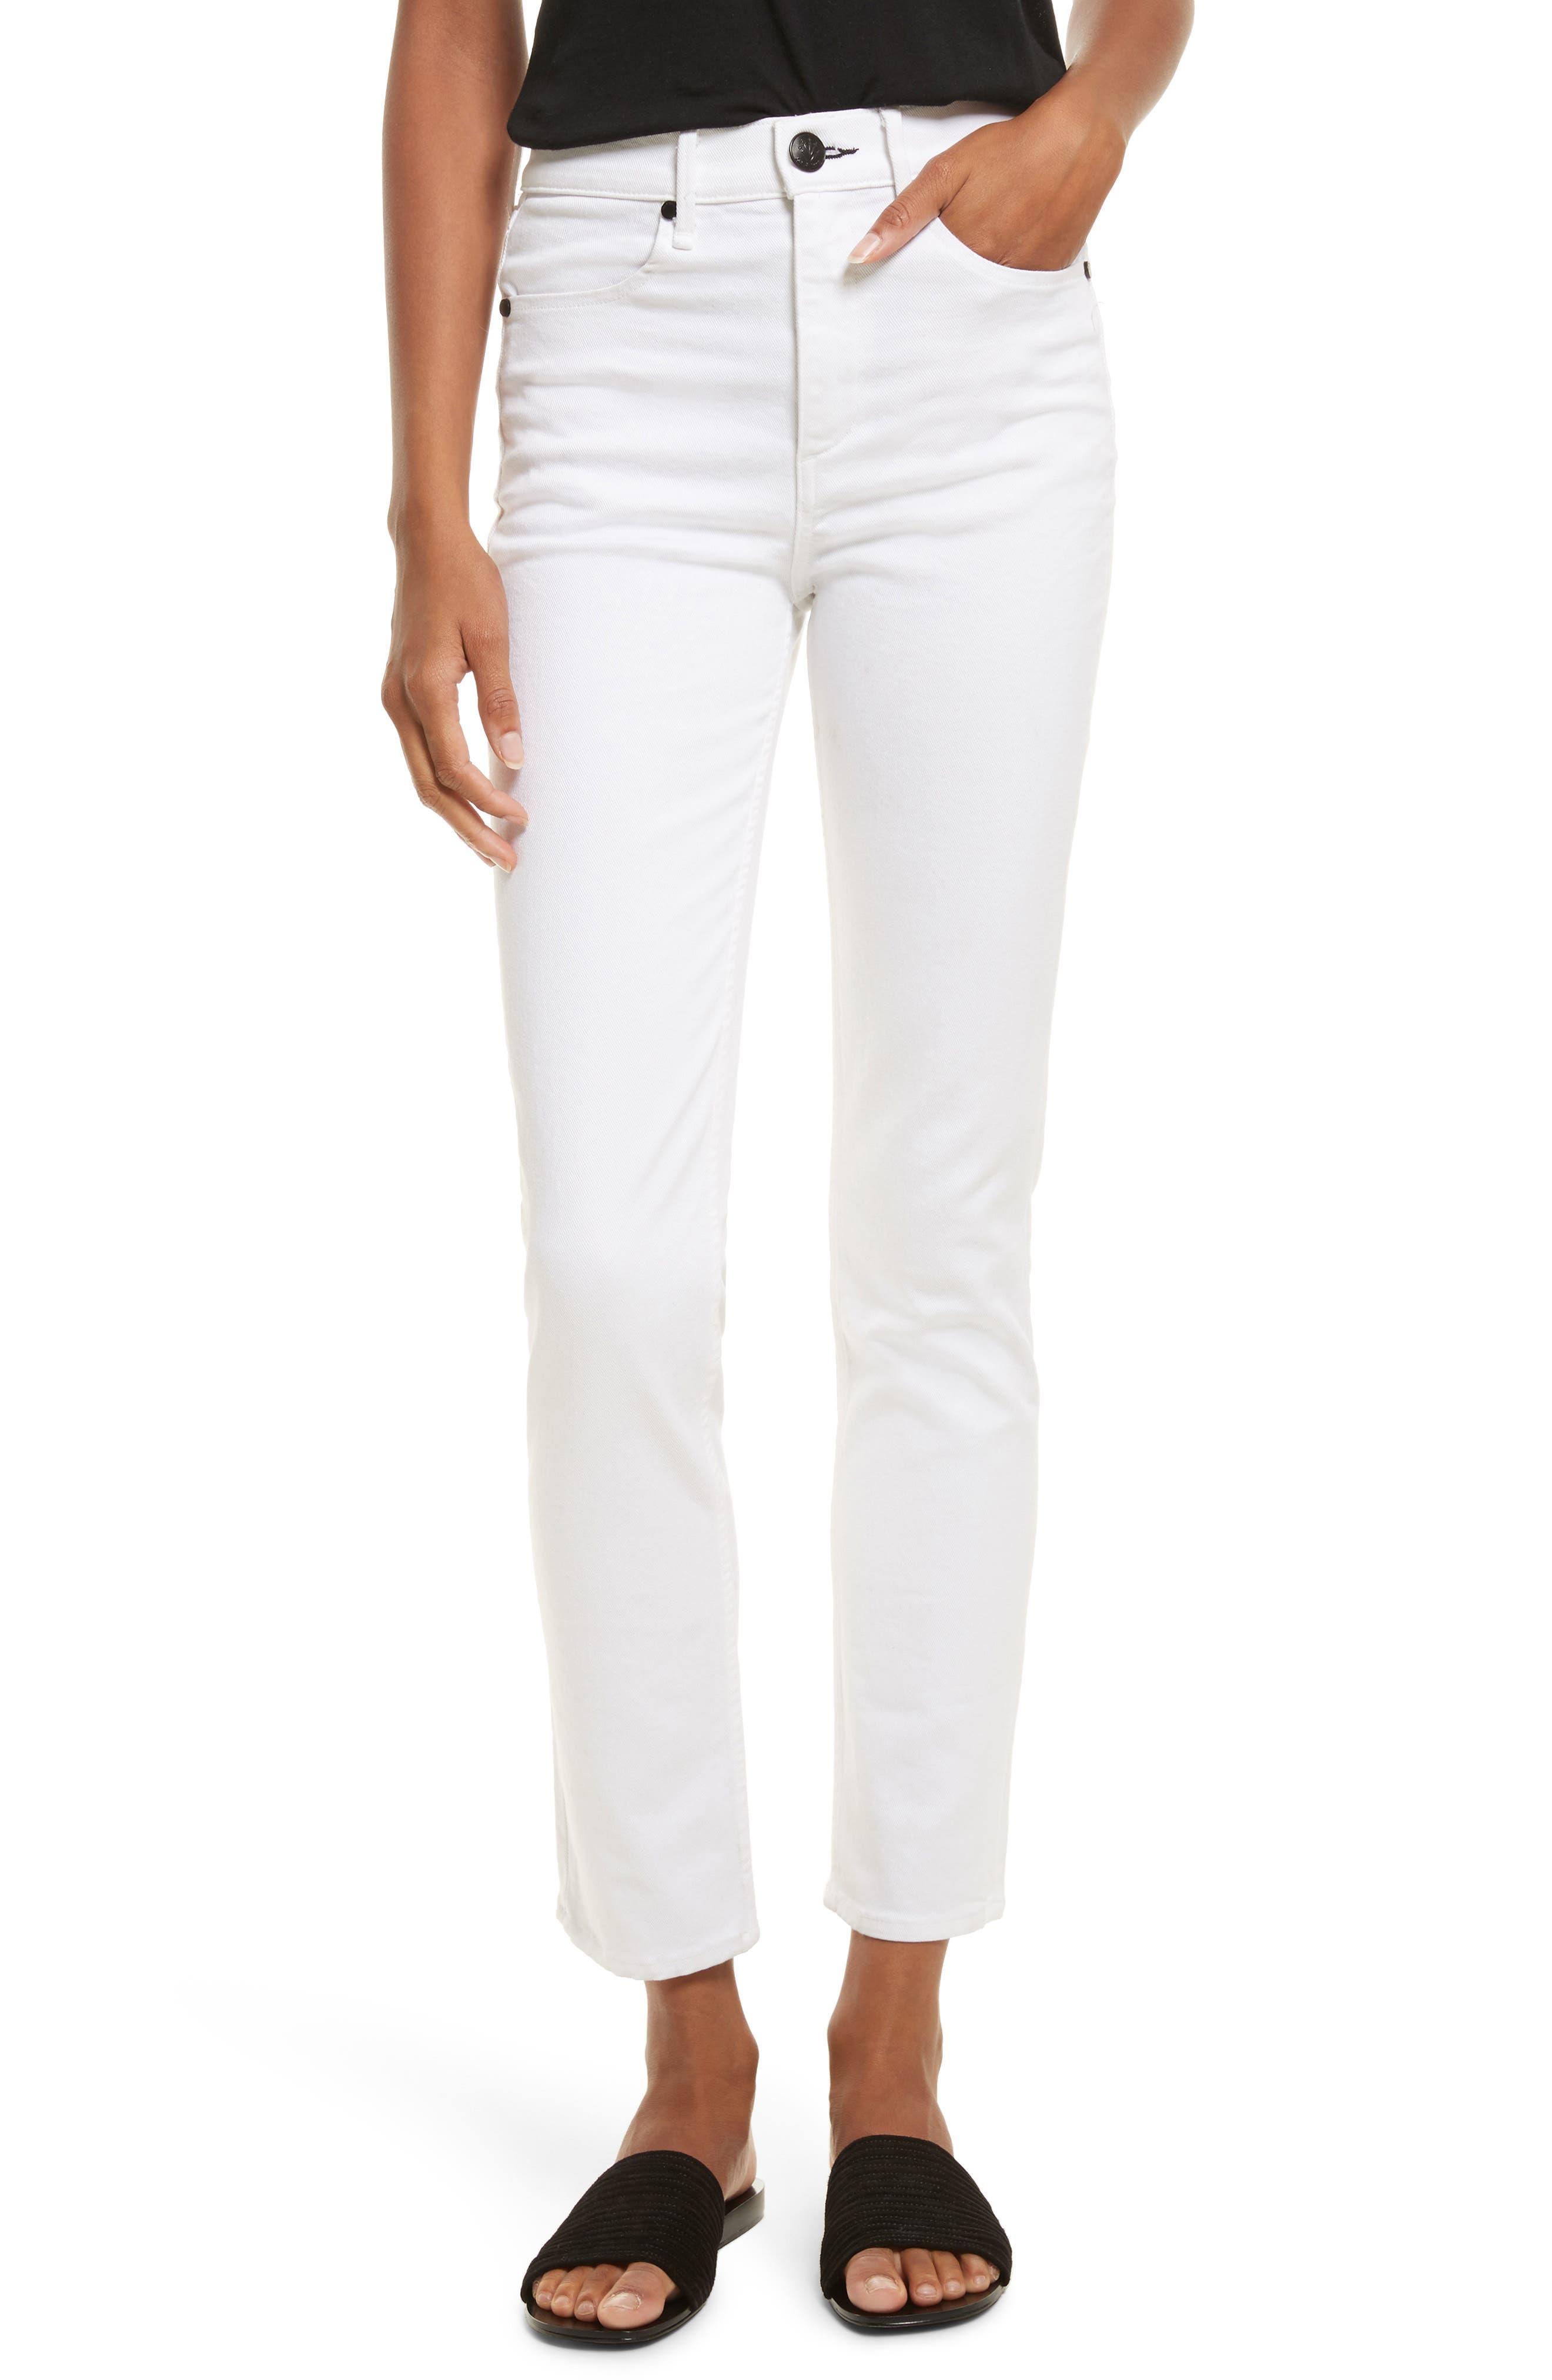 Alternate Image 1 Selected - rag & bone/JEAN High Waist Ankle Skinny Jeans